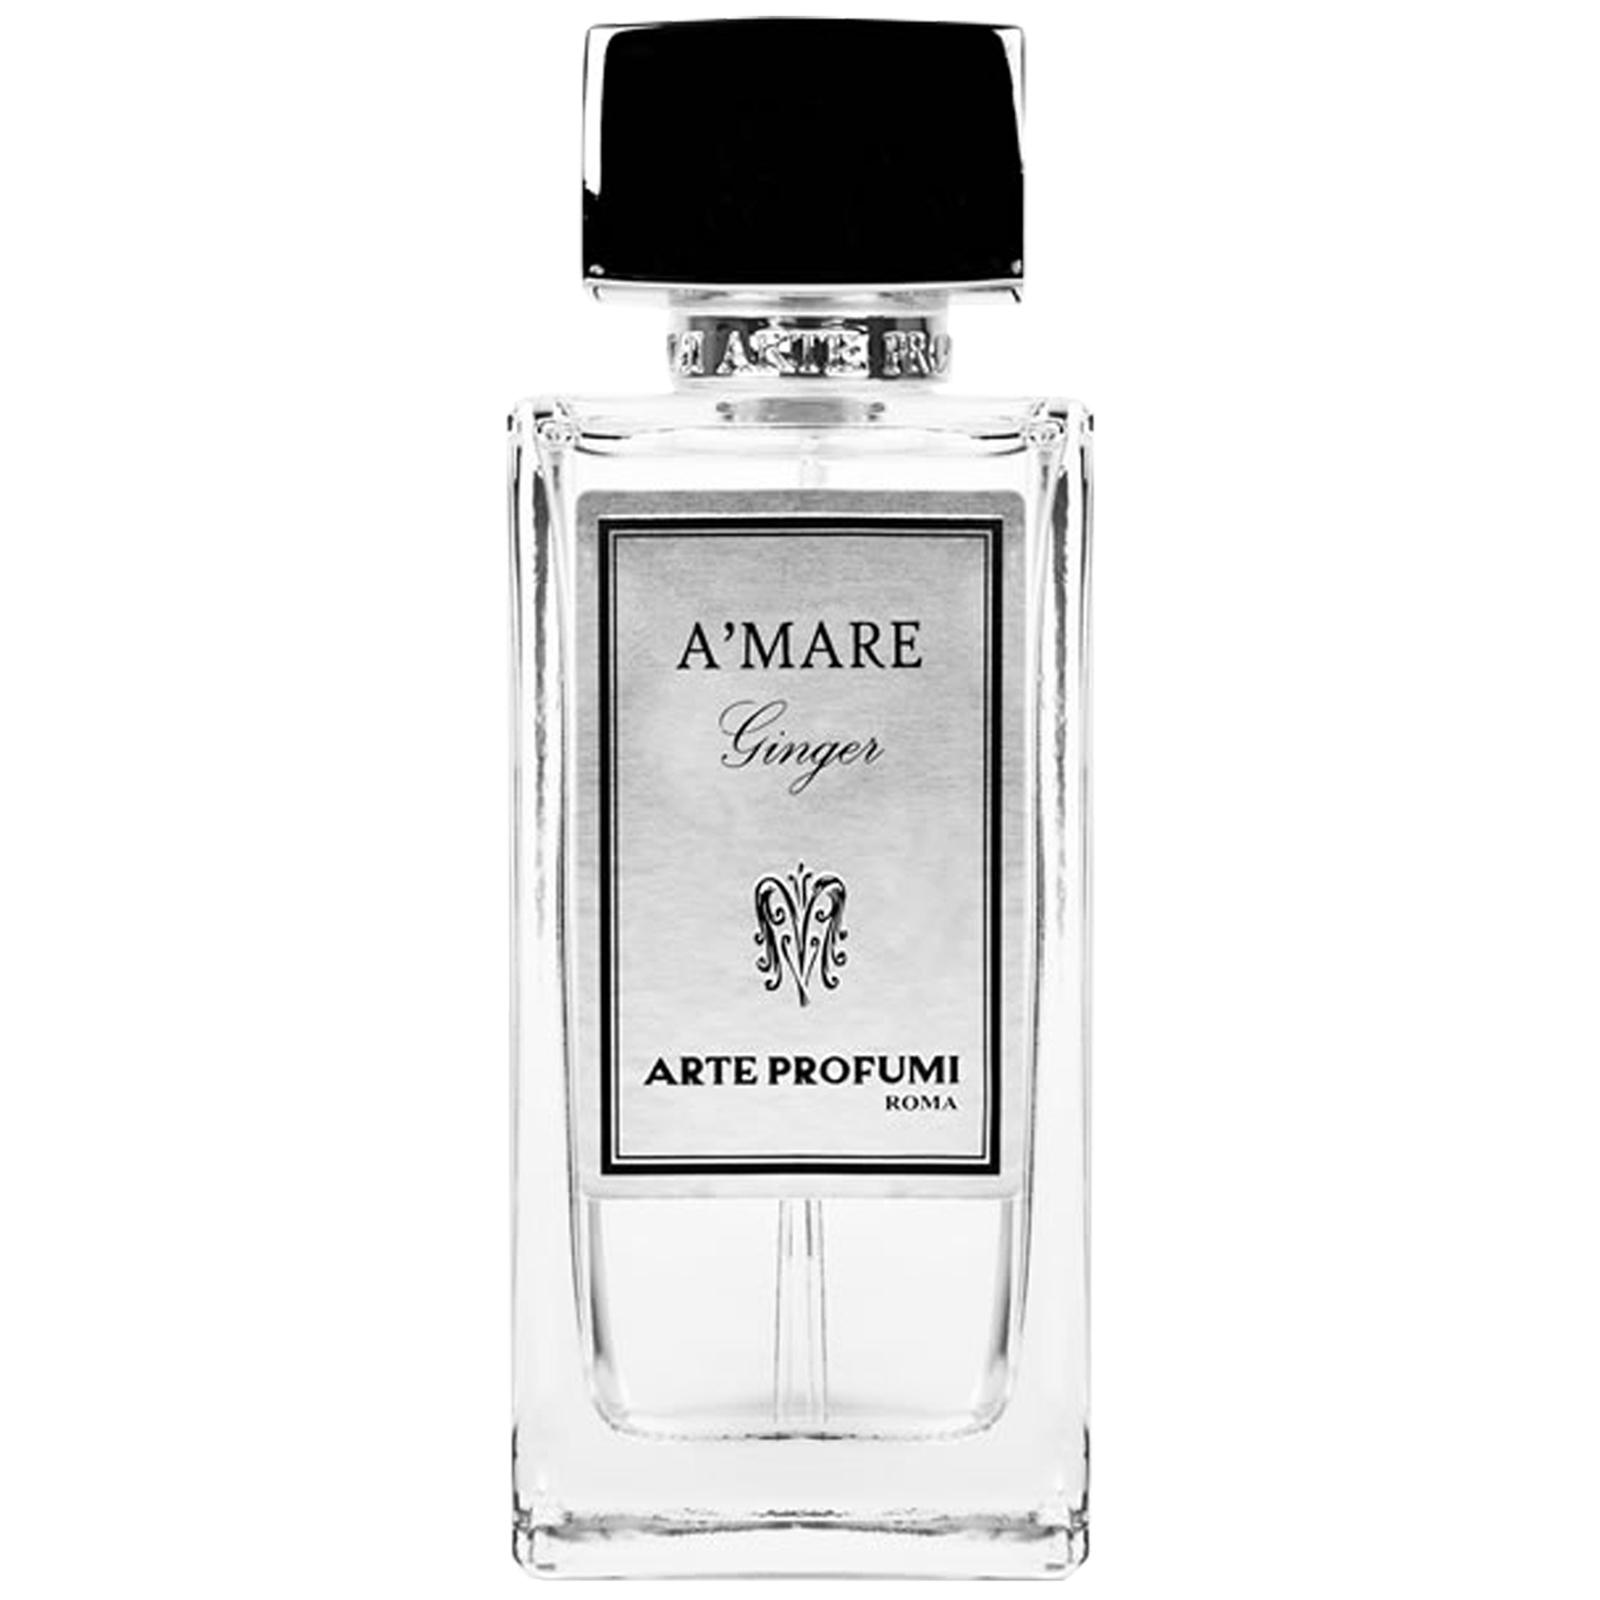 A mare profumo parfum 100 ml